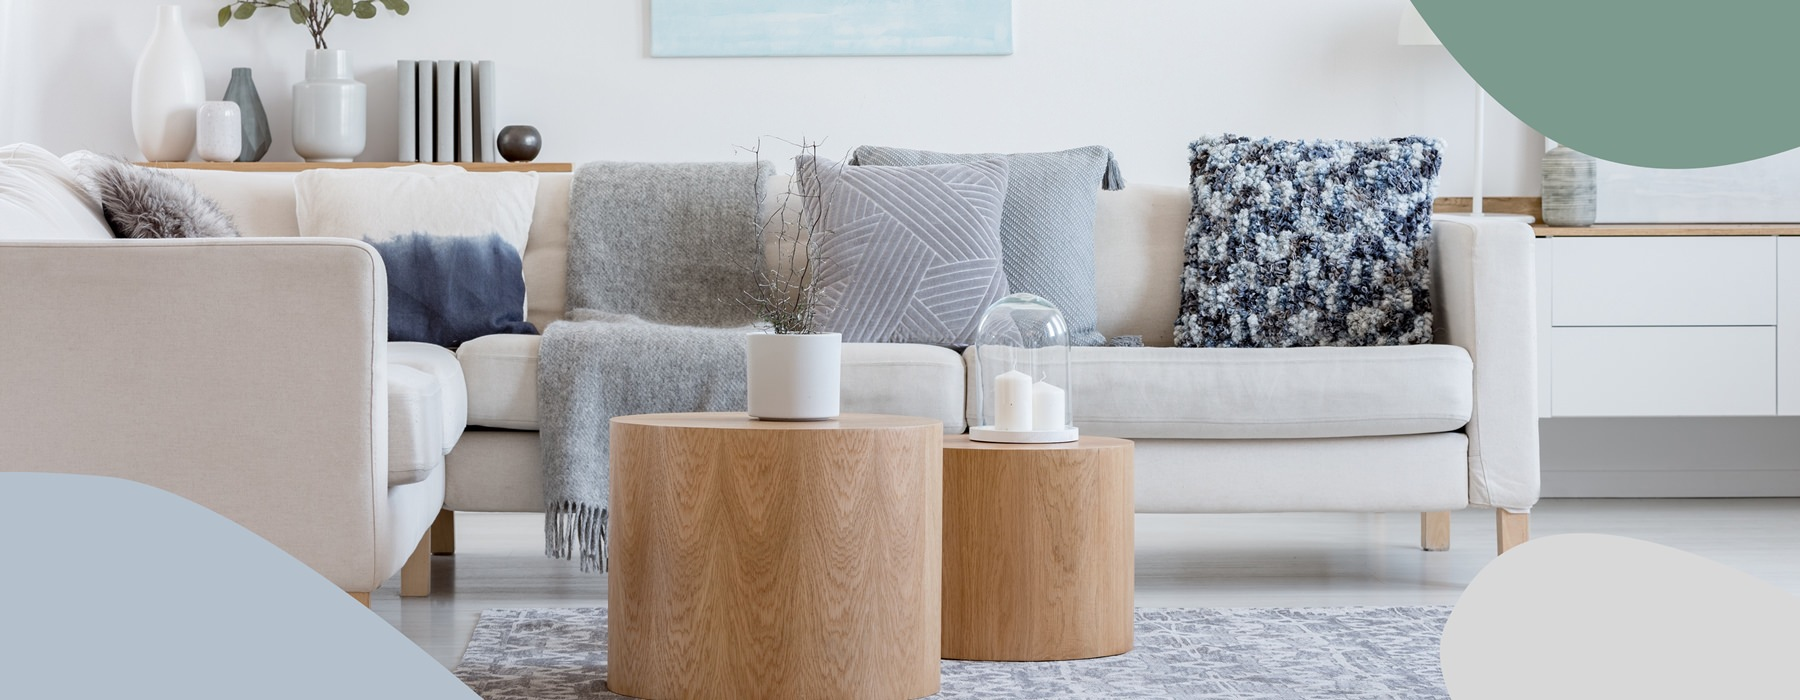 furnished living room, lifestyle image